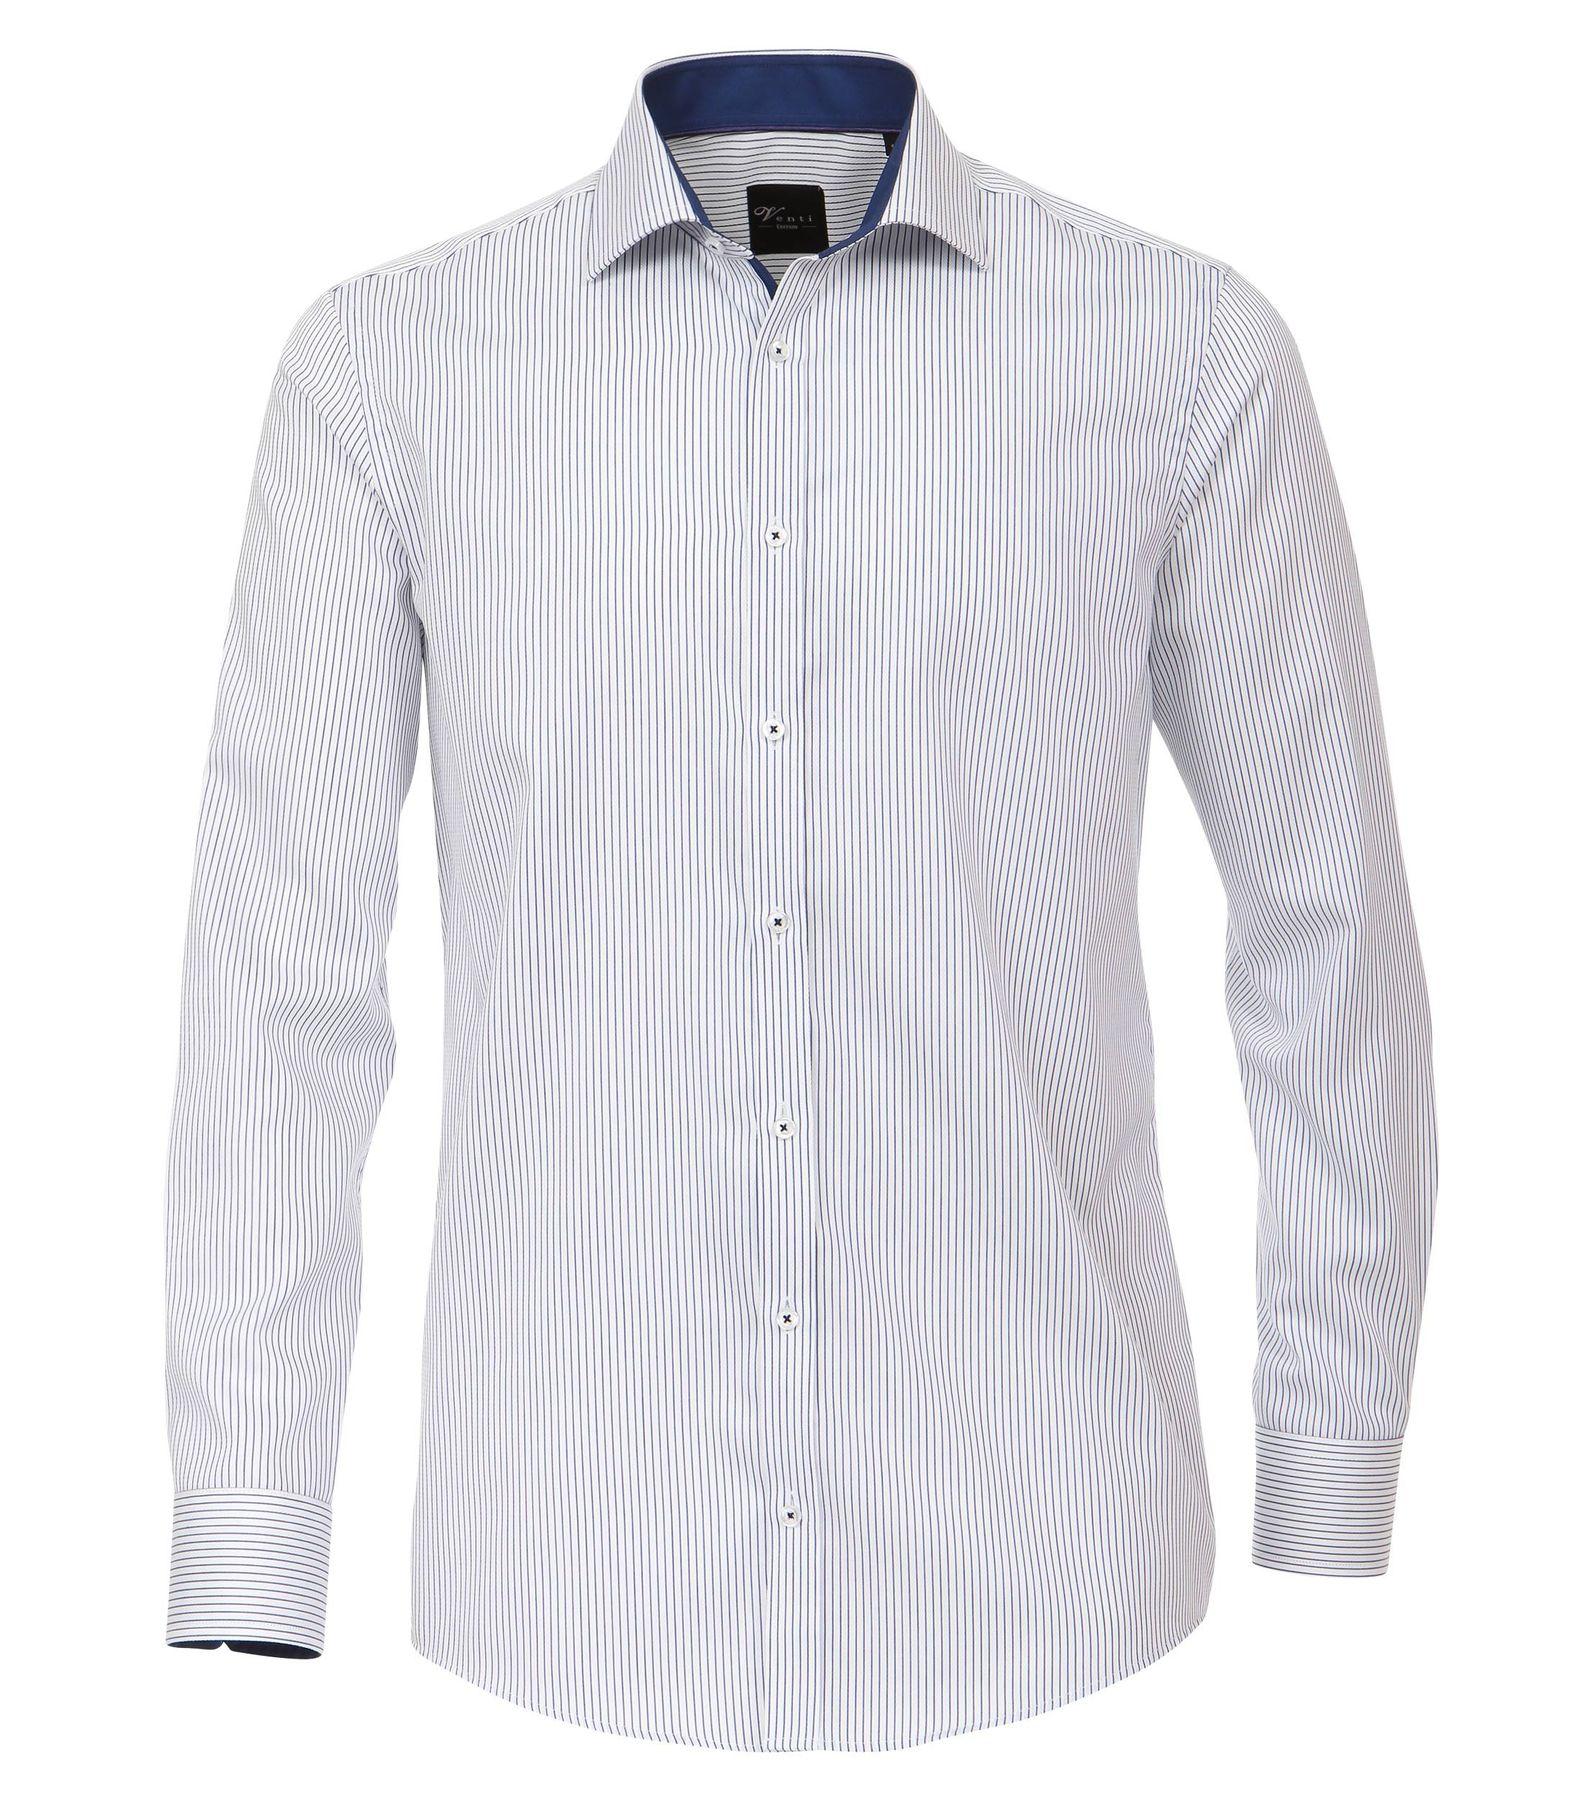 Venti - Slim Fit - Herren Langarm Hemd gestreift mit Kent Kragen (172678700) – Bild 2